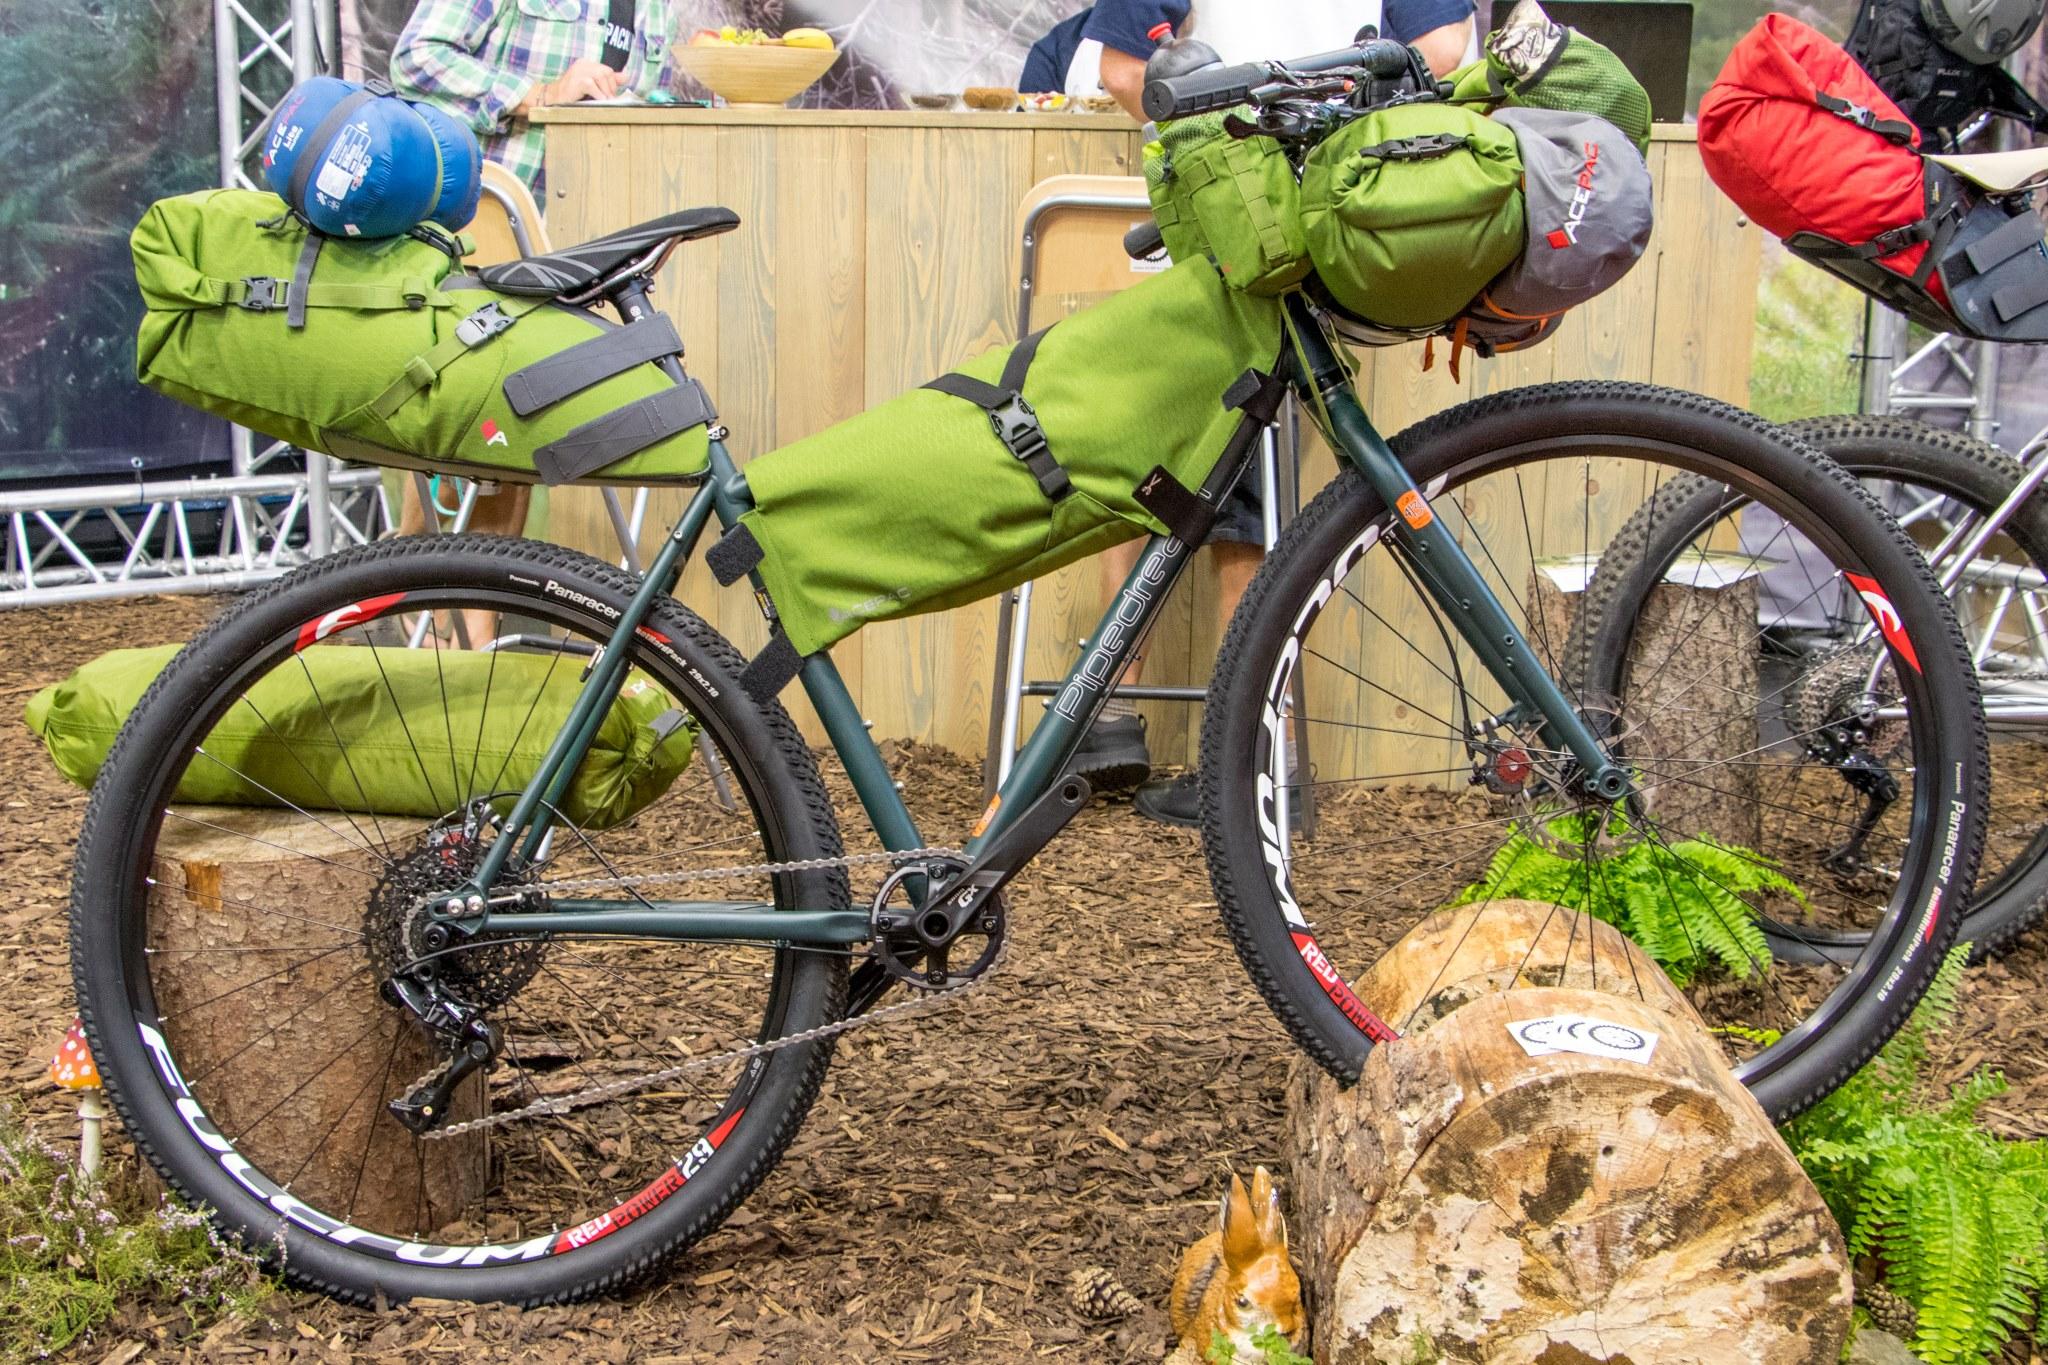 acepack_bikepacking010